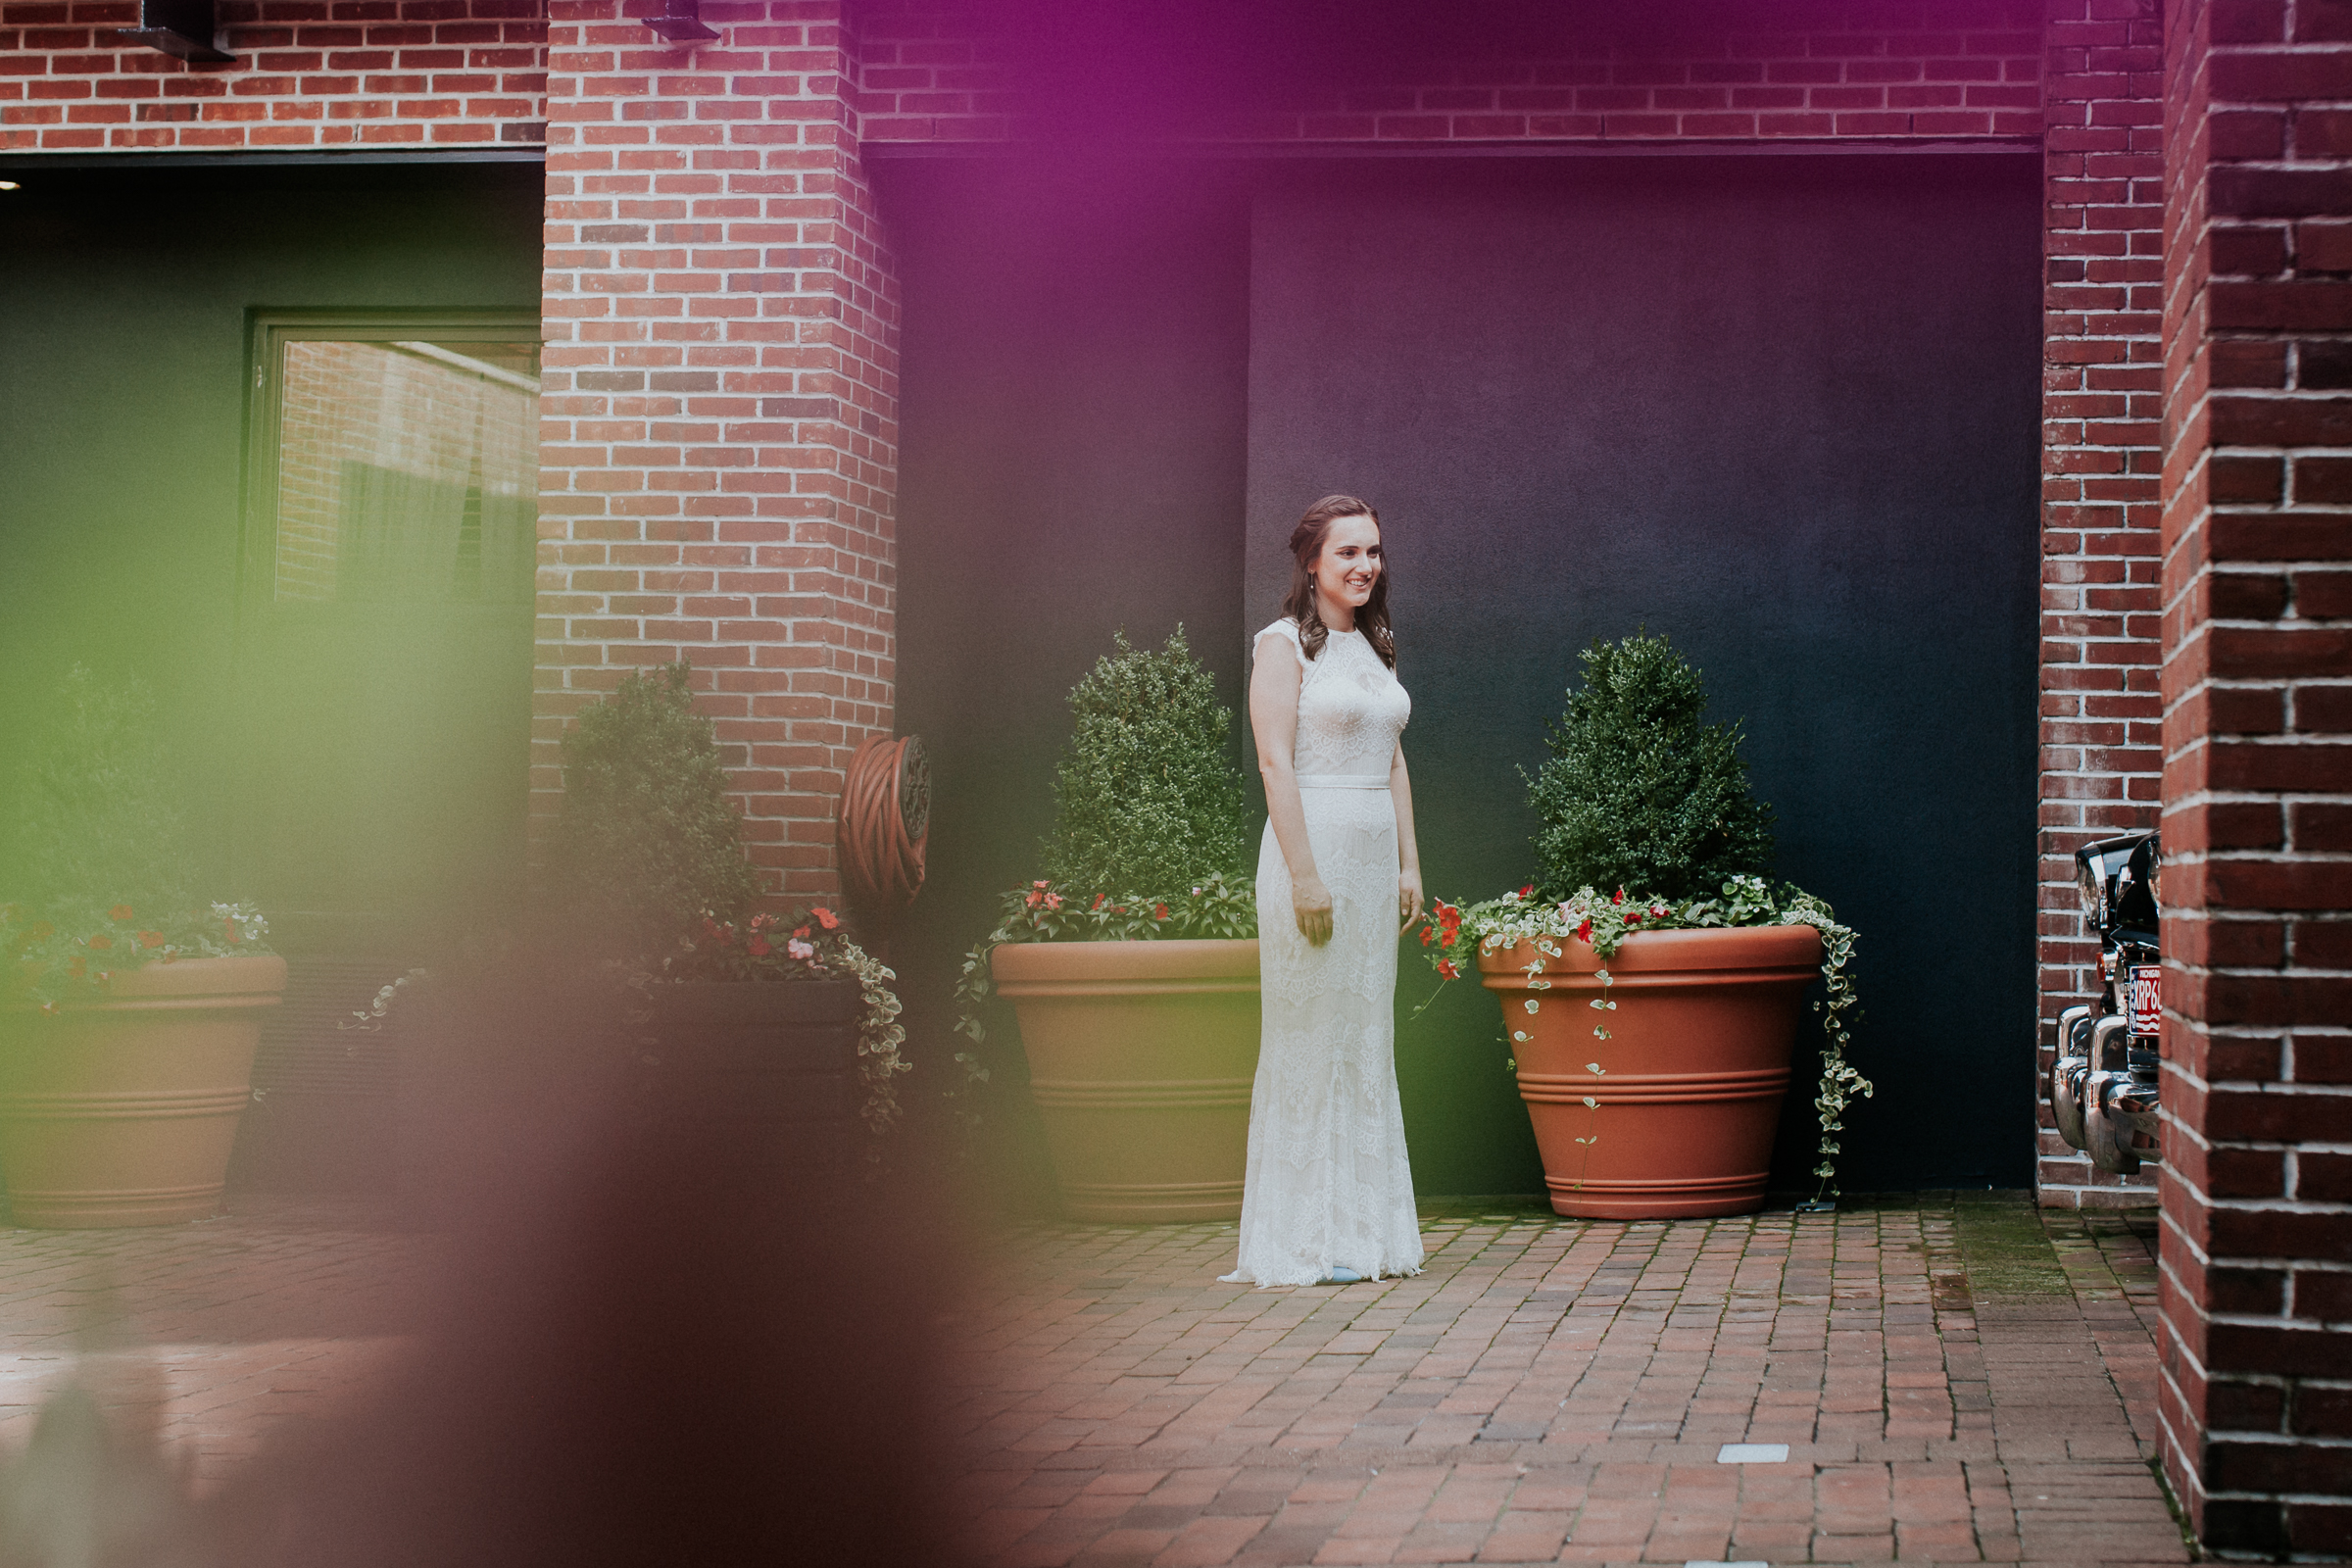 My-Moon-Brooklyn-LGBT-Gay-Documentary-Wedding-Photographer-20.jpg